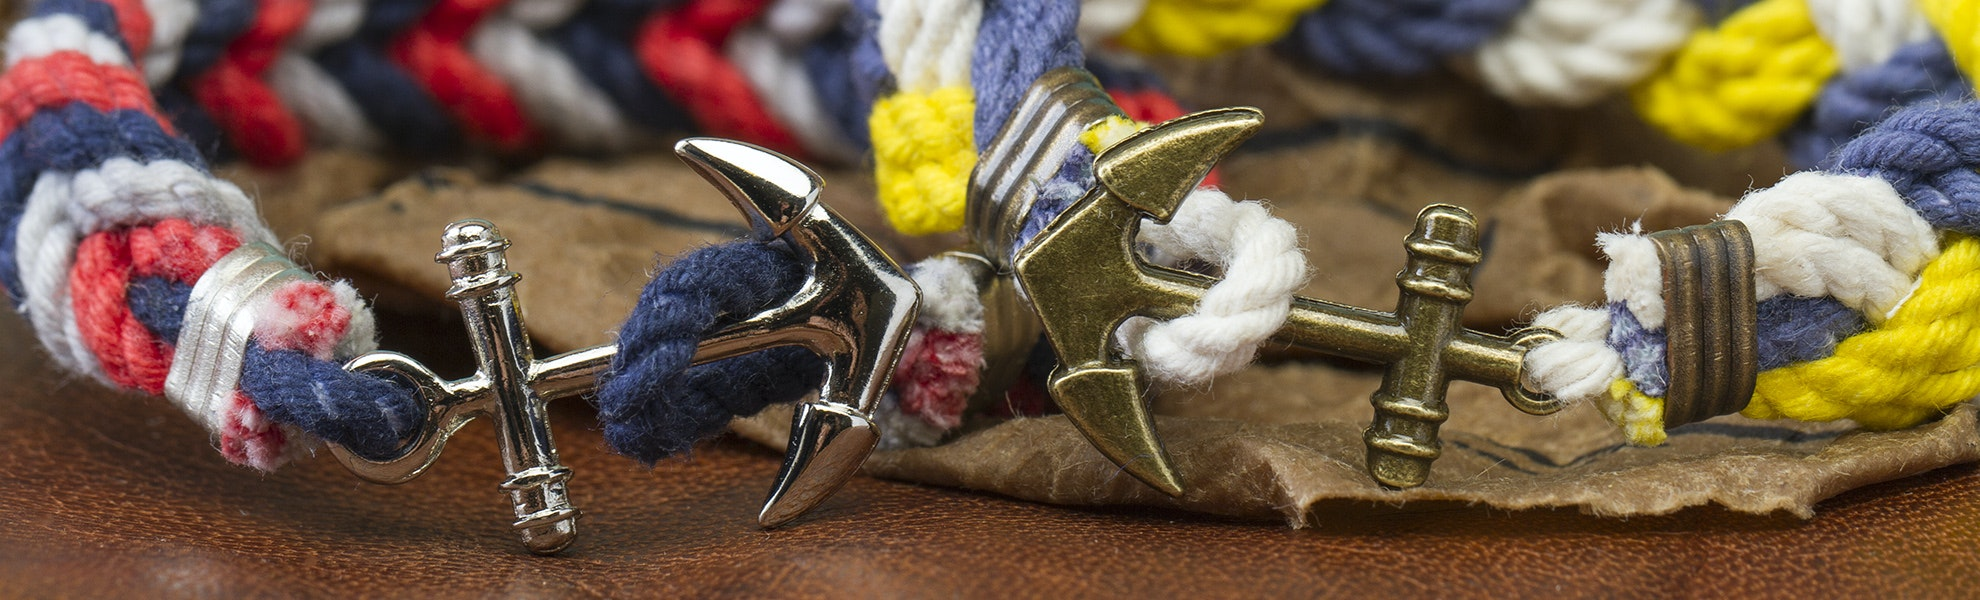 Knotical Knovelties Anchor Bracelet